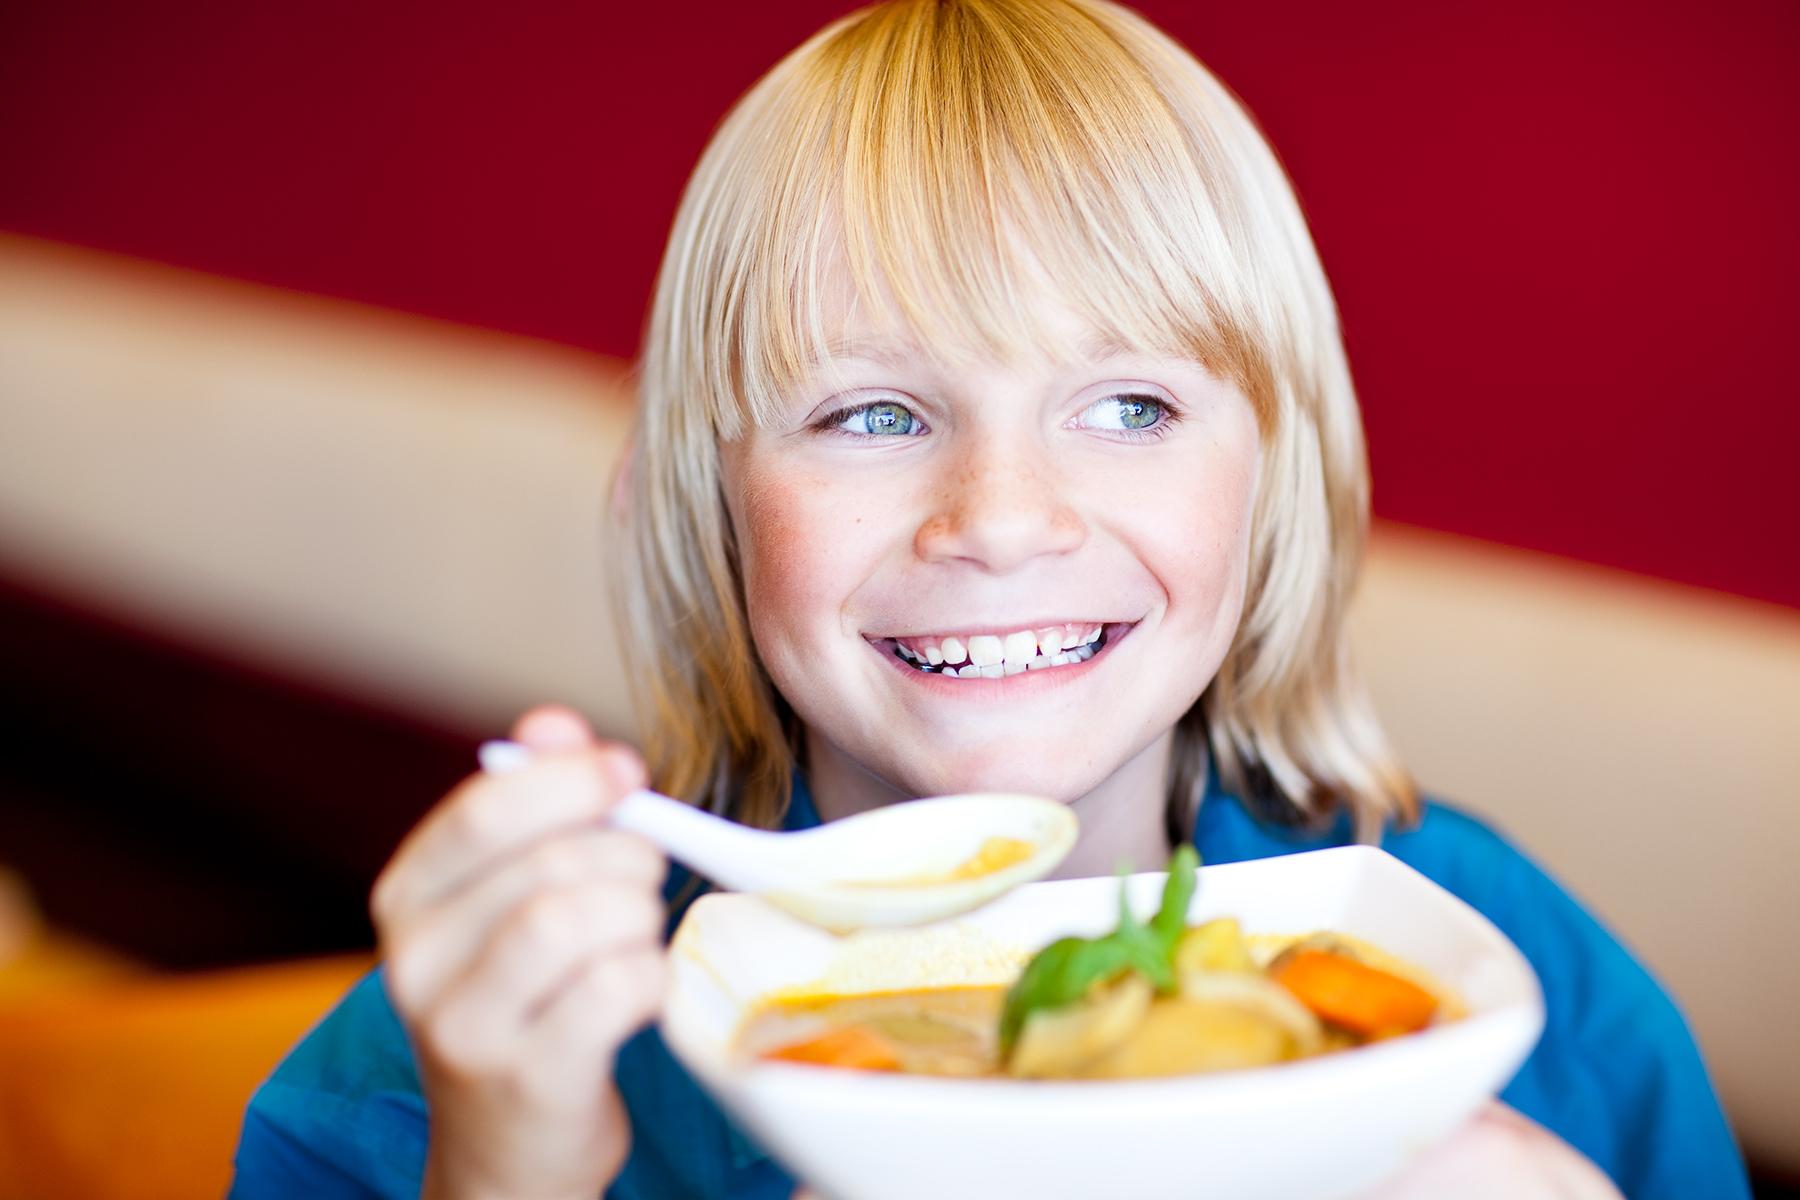 smiling blonde boy eating kids art director photography